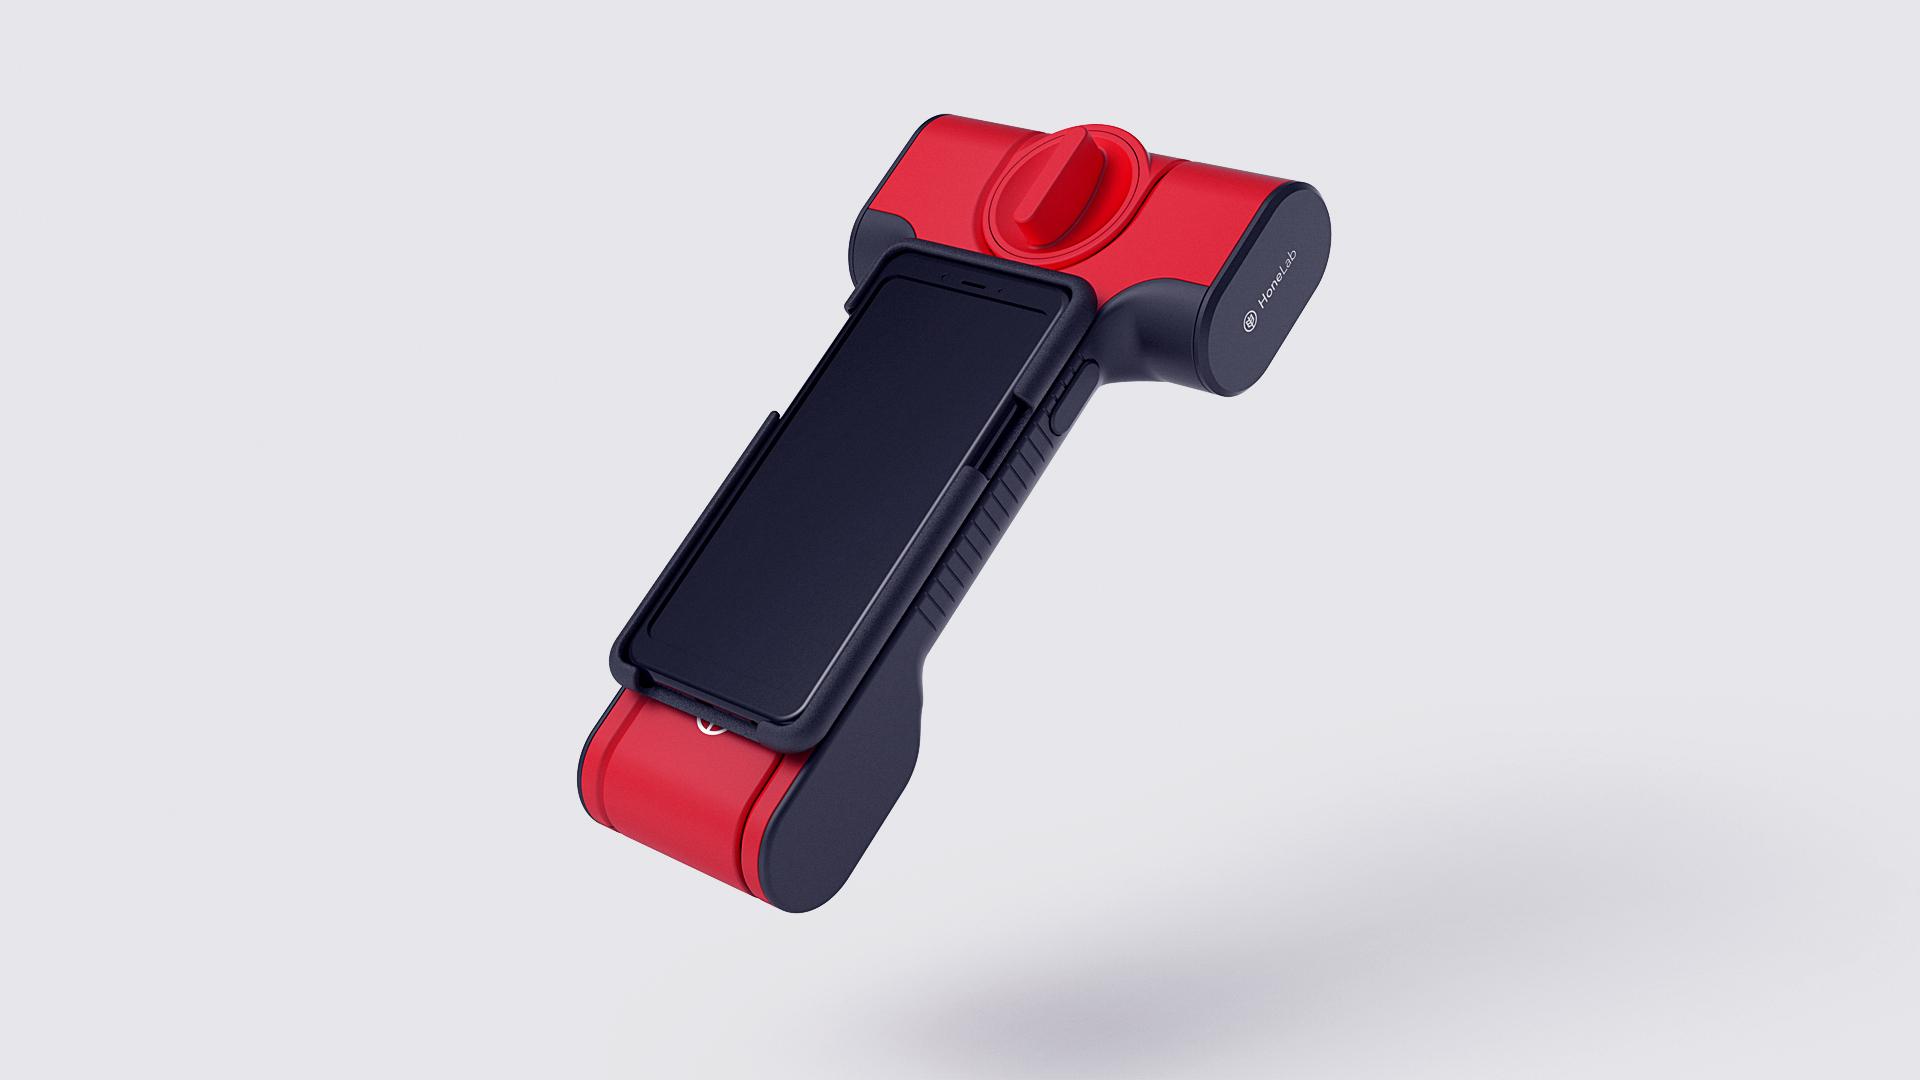 HoneLab analyser attached to smartphone